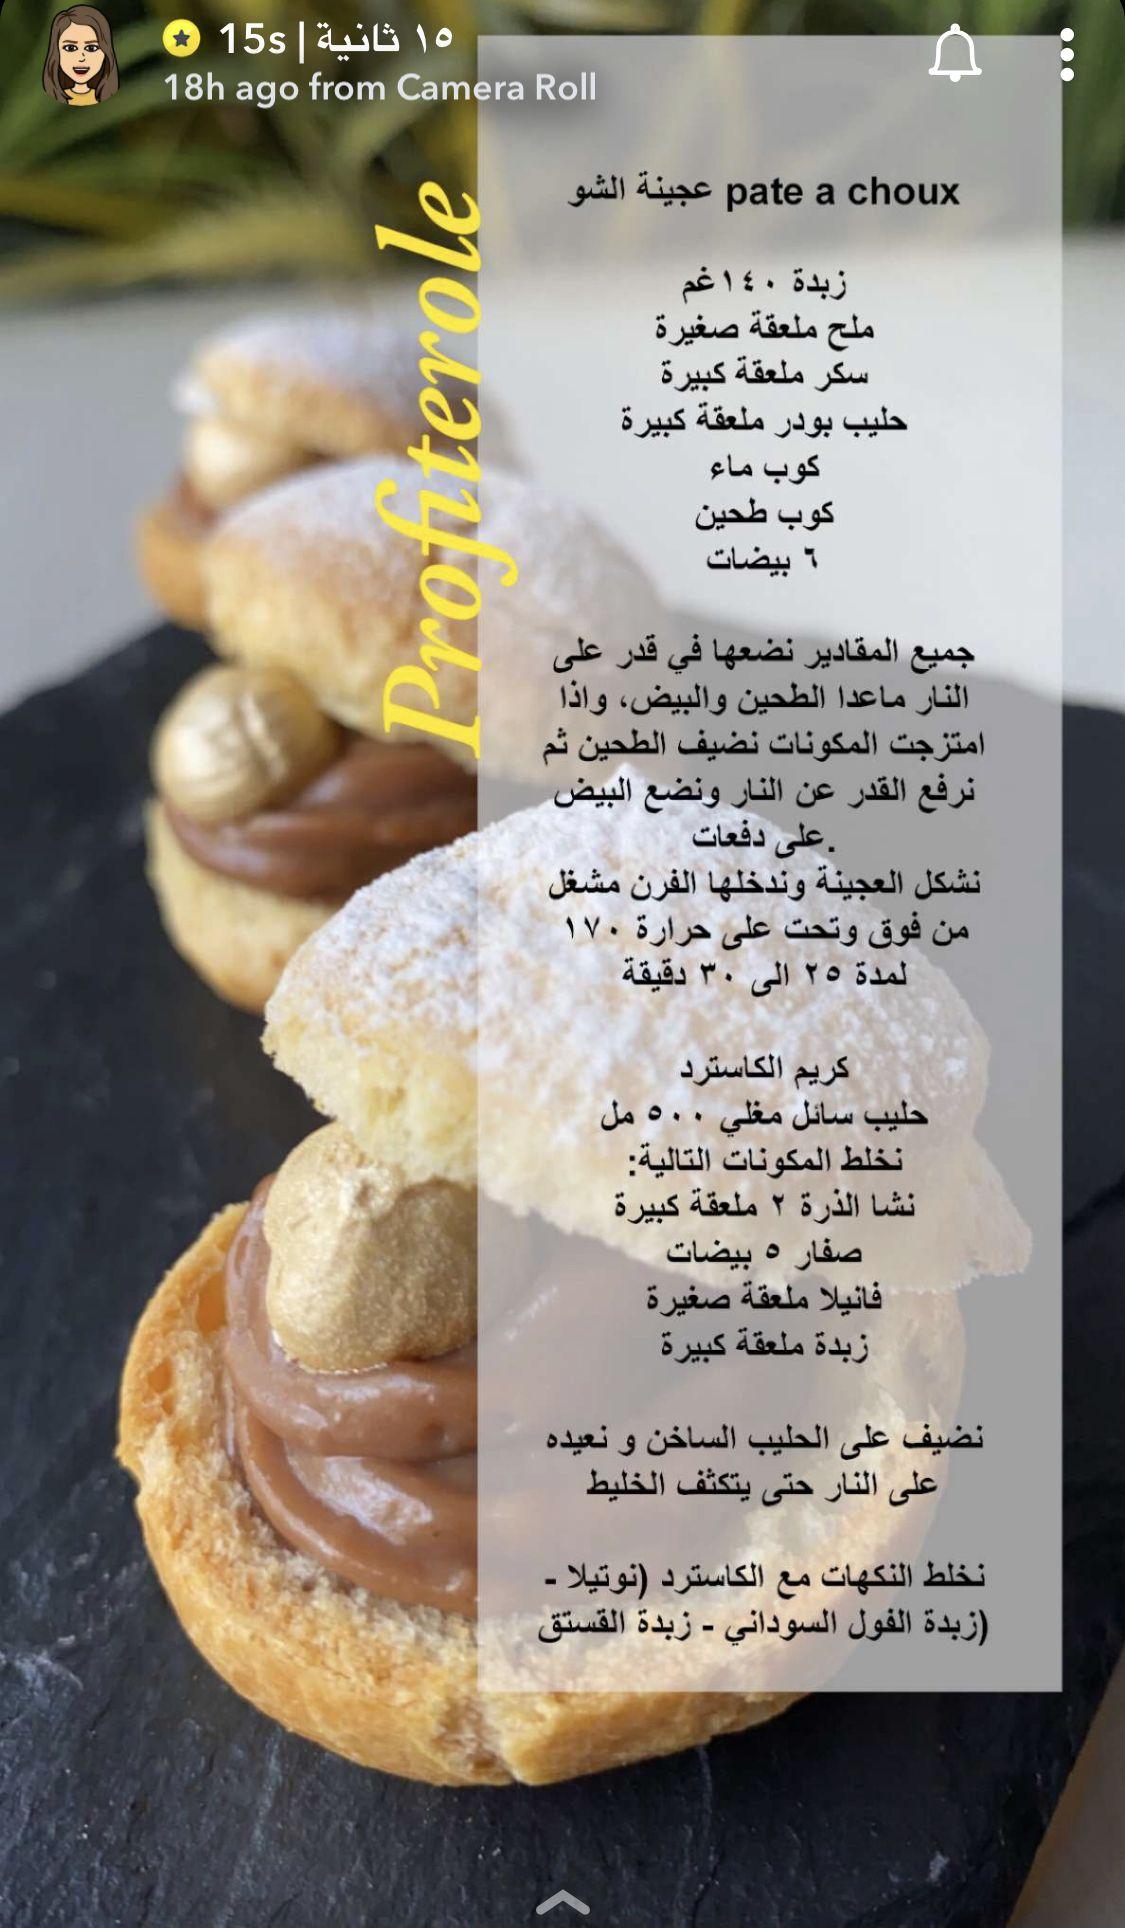 Pin By Jiji 2014 On Sugar Sugar Desert Recipes Recipes Food